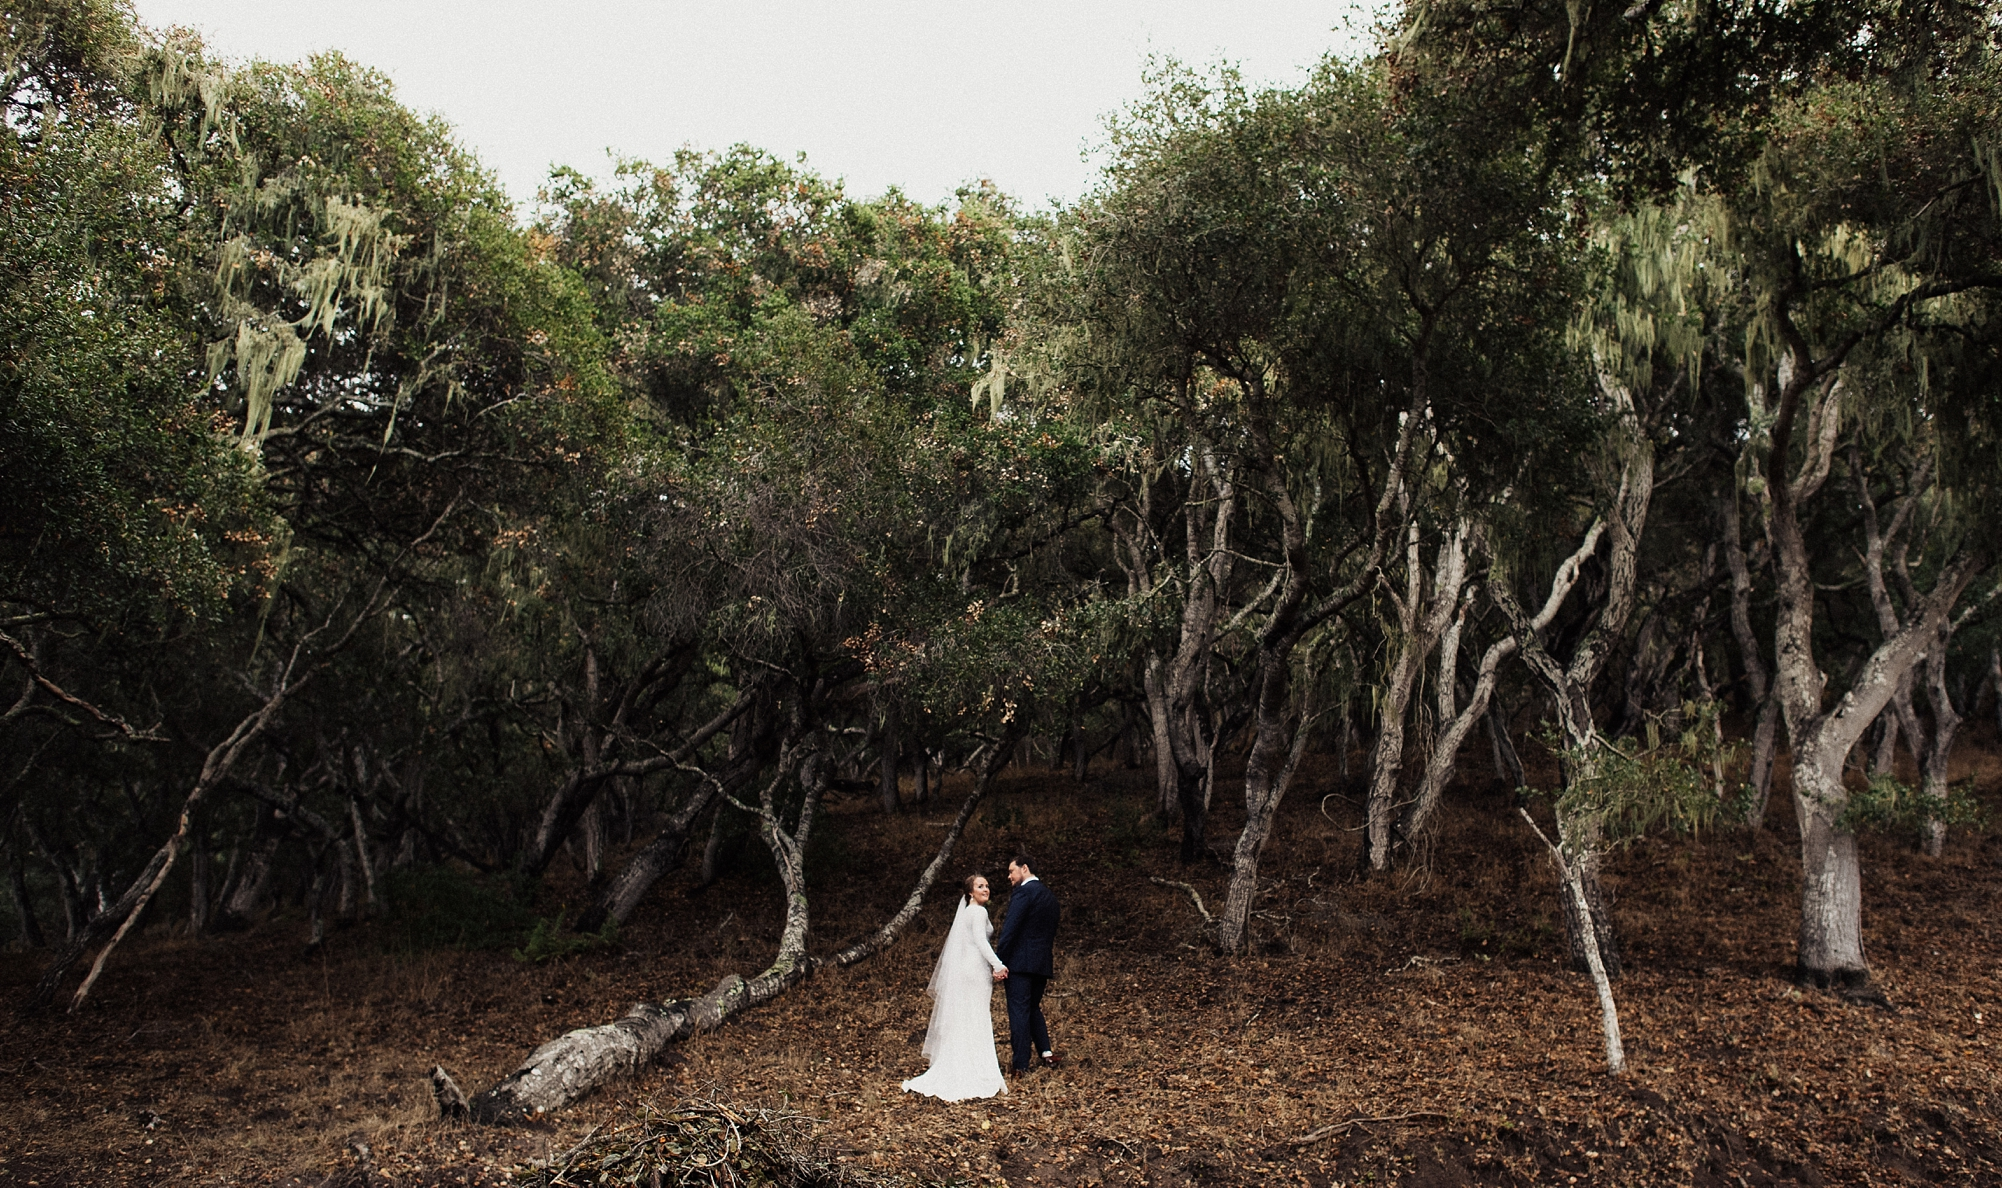 edenstraderphoto-weddingphotographer_1407.jpg